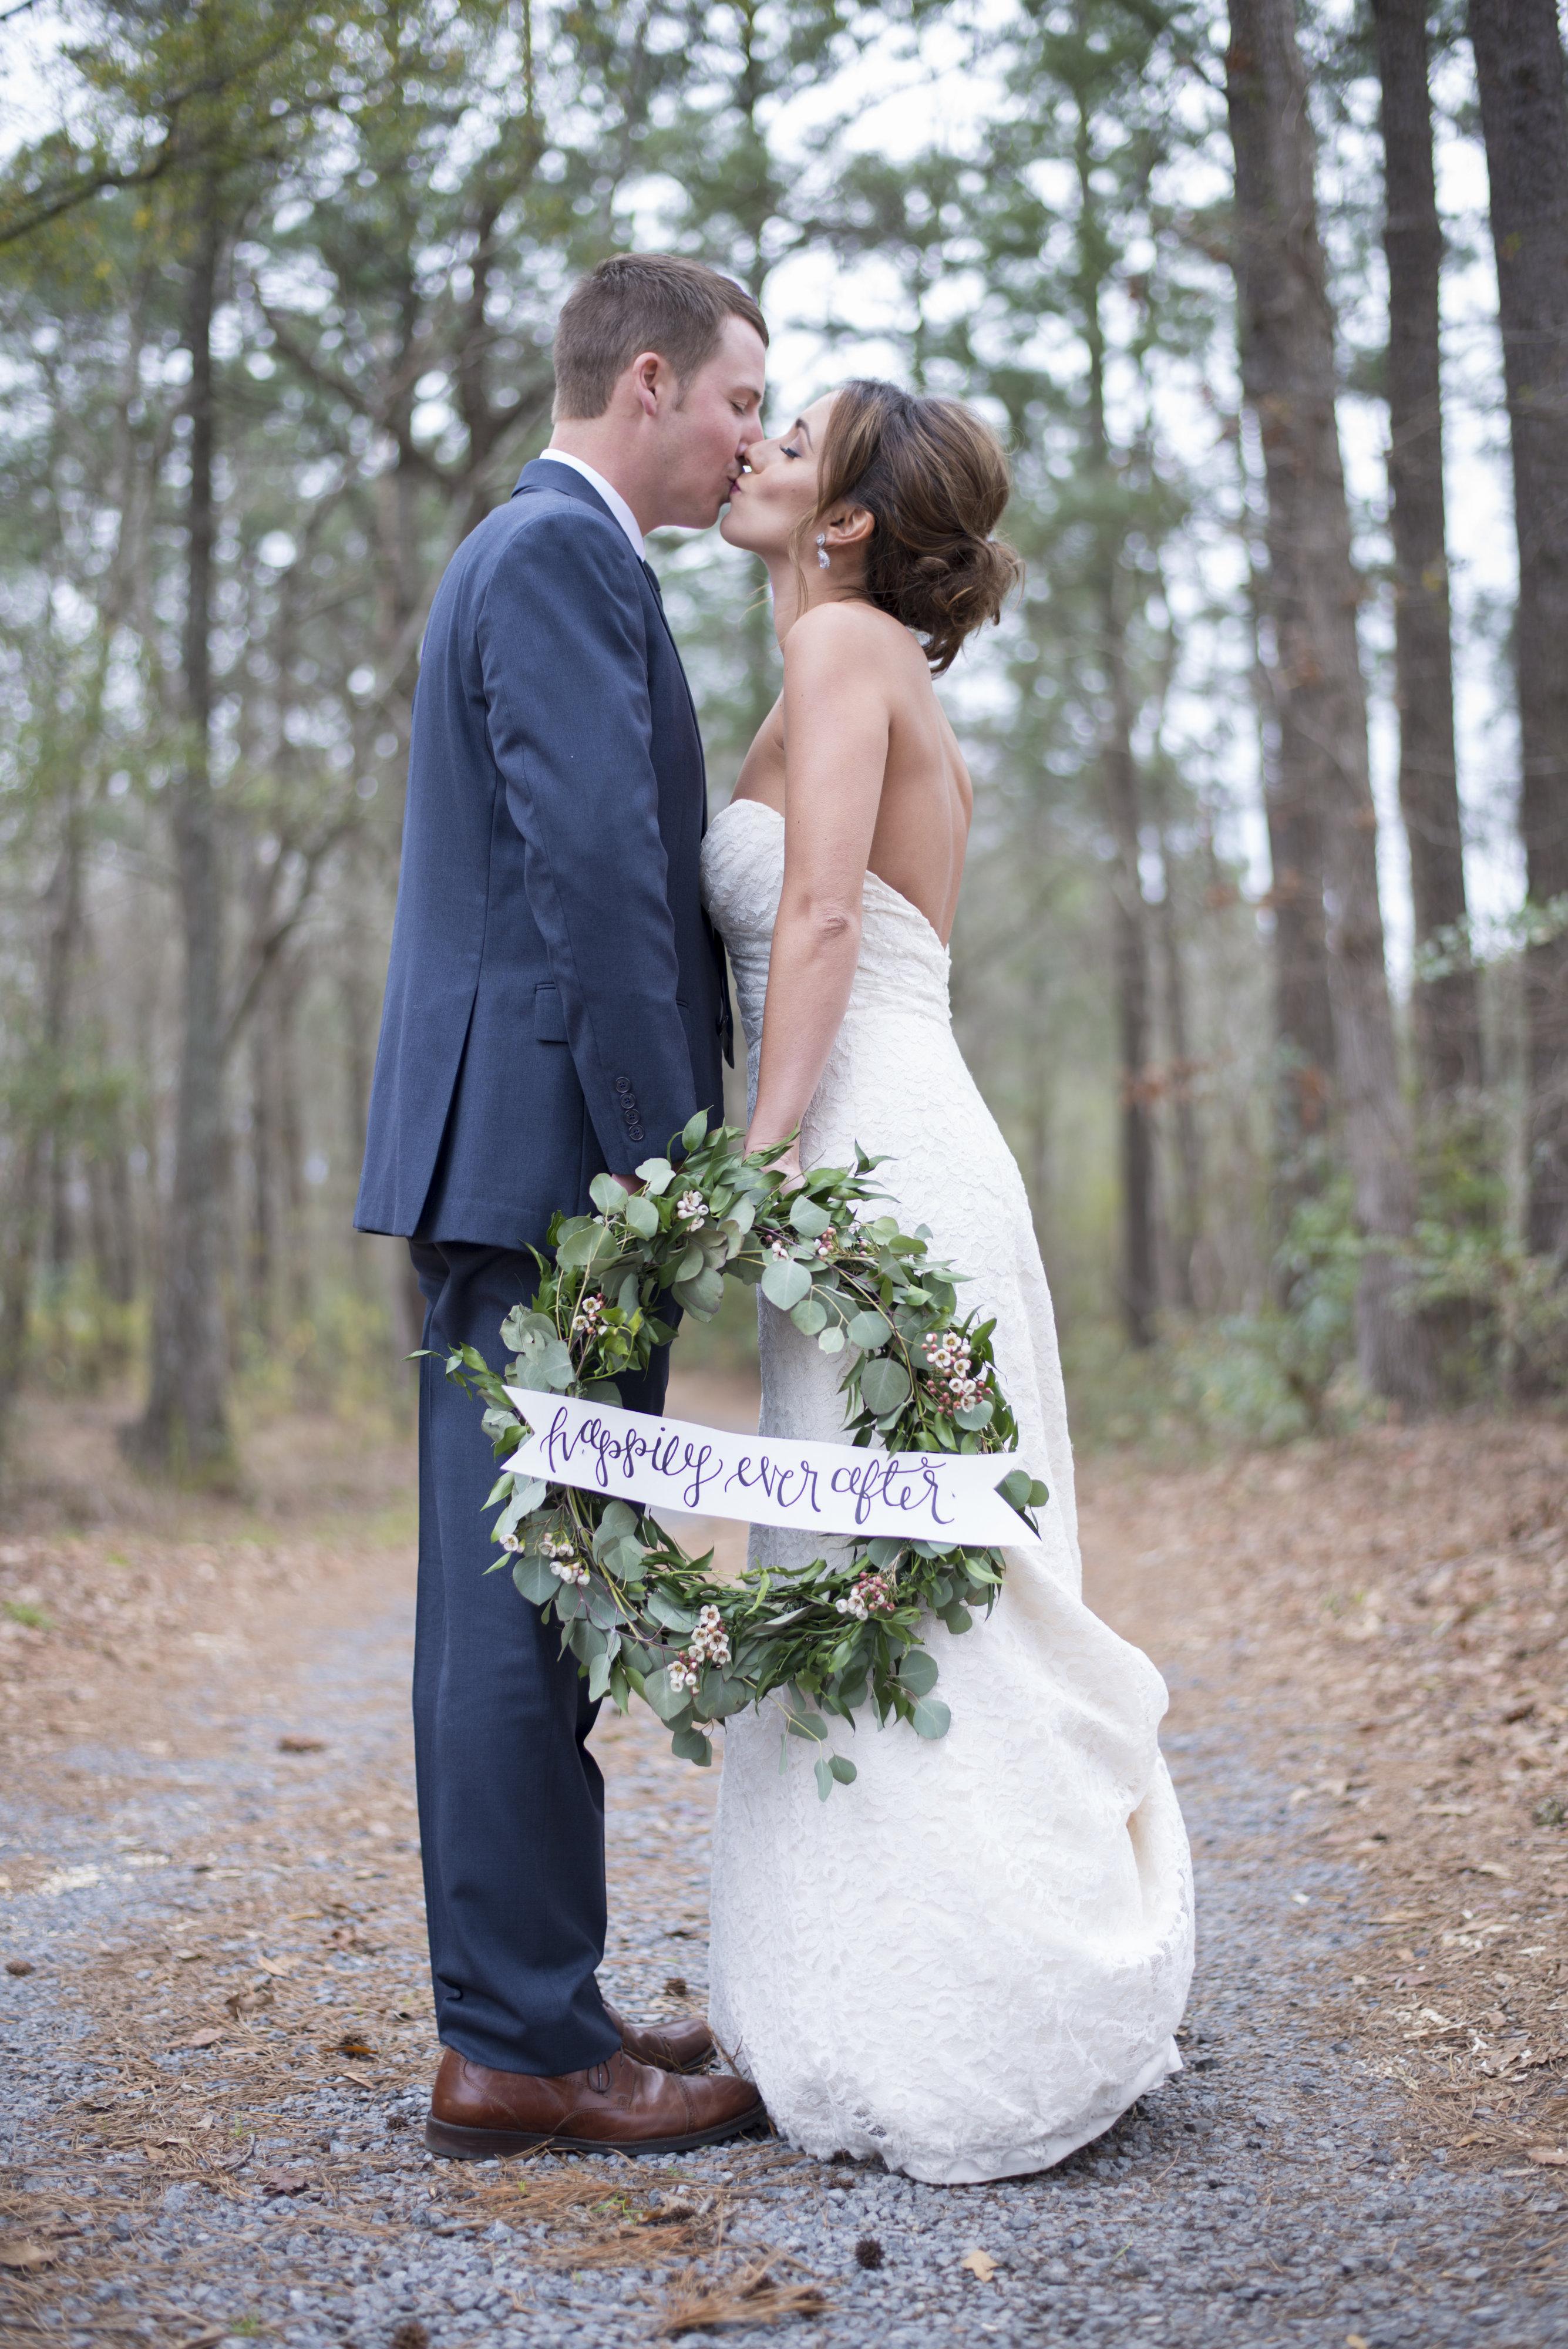 Southern Winter Wedding Inspiration Rustic Wedding Chic